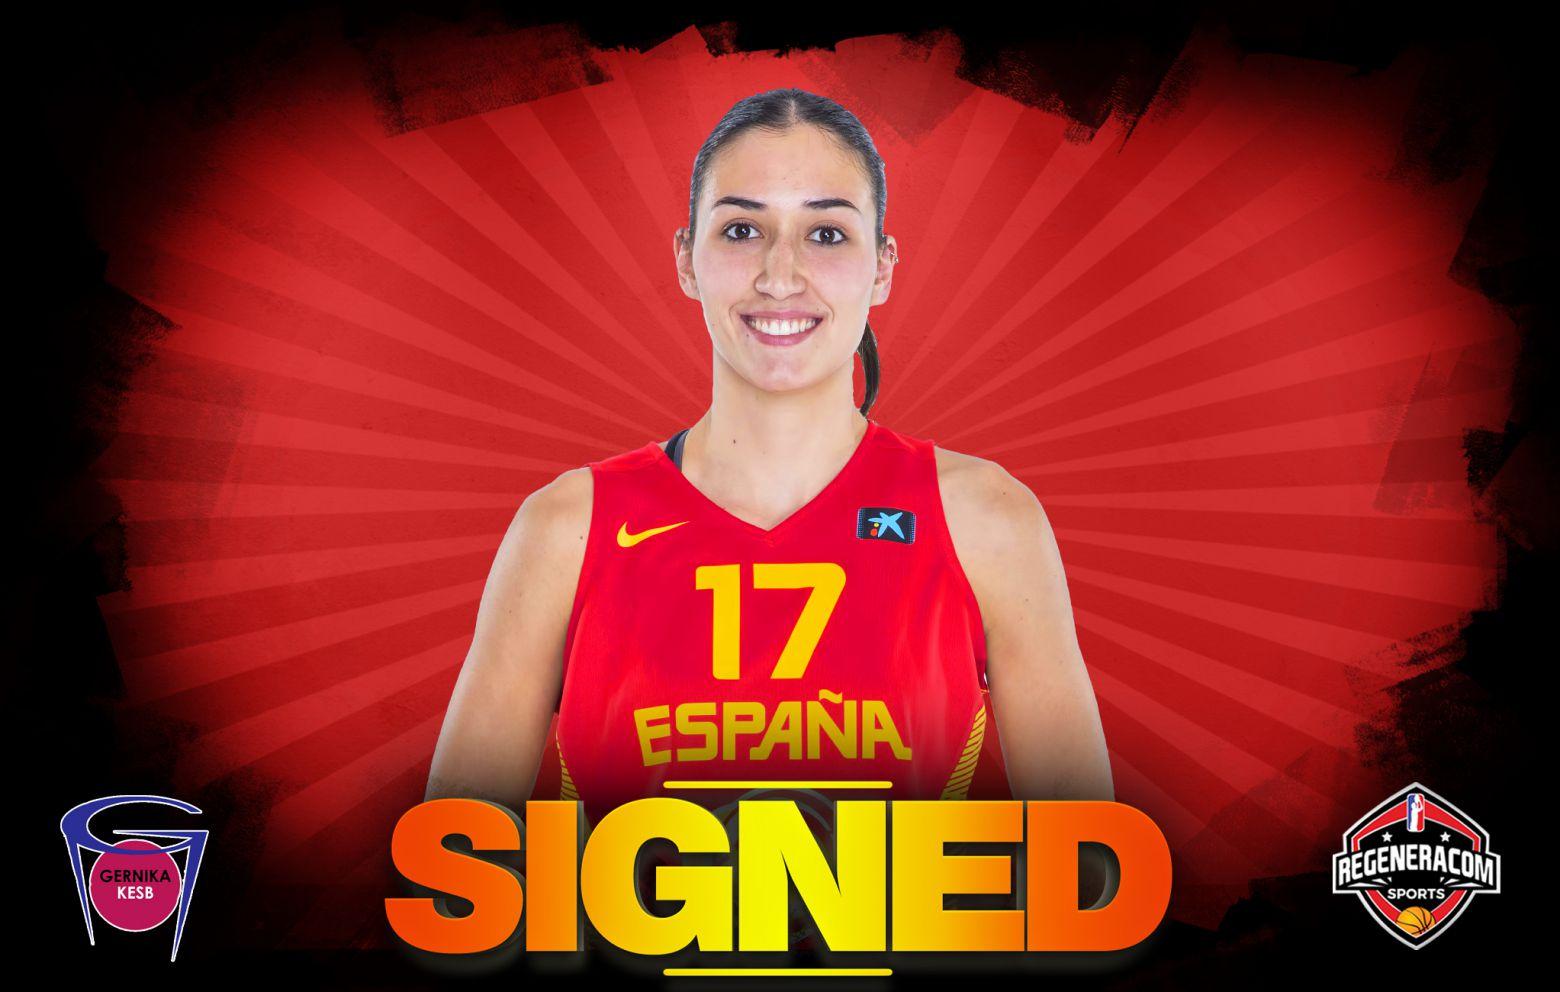 BELÉN ARROJO has signed in Spain with Gernika Bizkaia